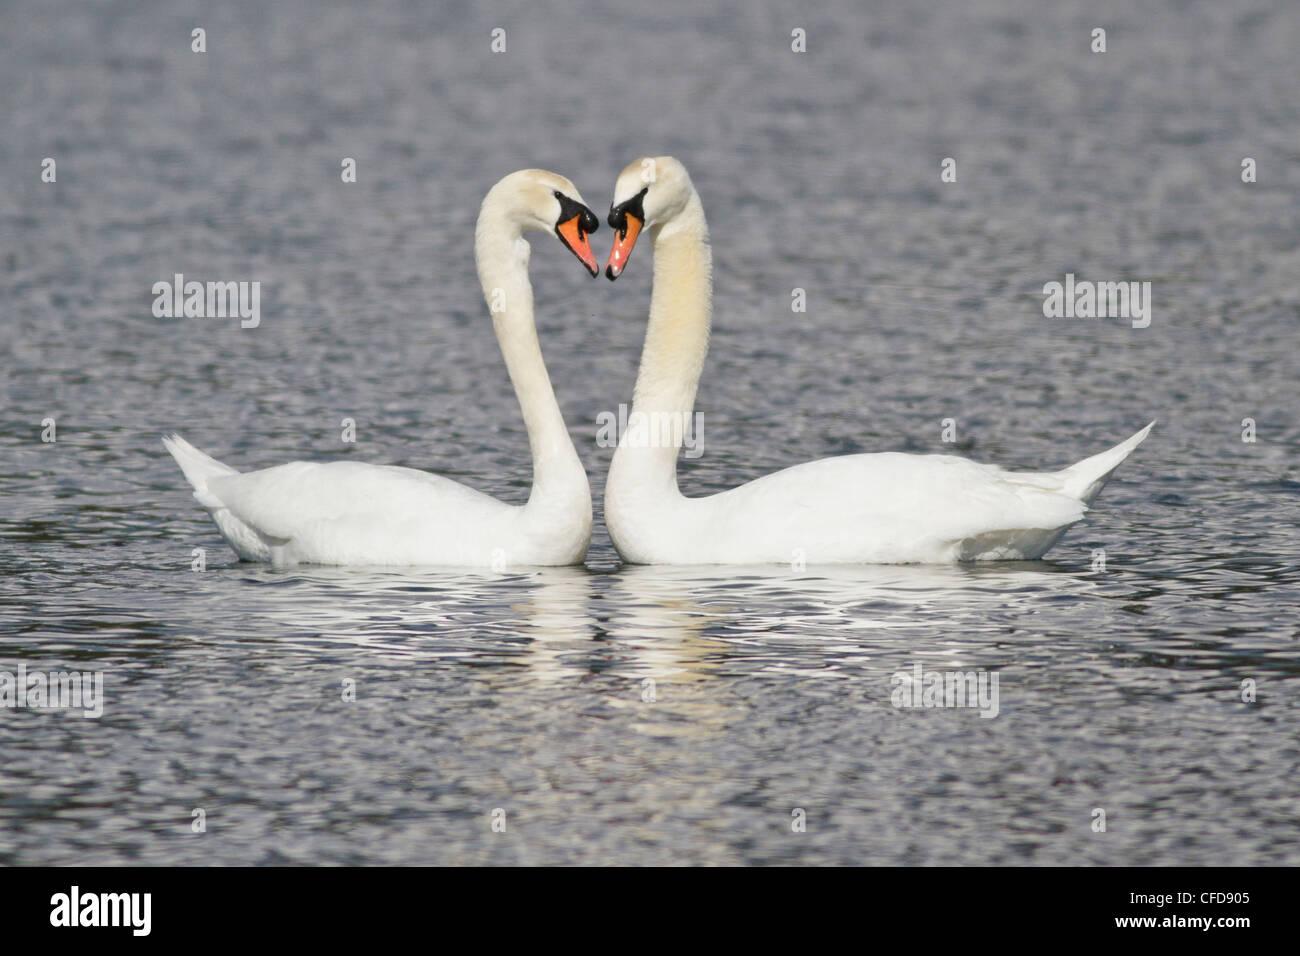 Mute Swan (Cygnus olor) swimming in a pond near Victoria, BC, Canada. - Stock Image